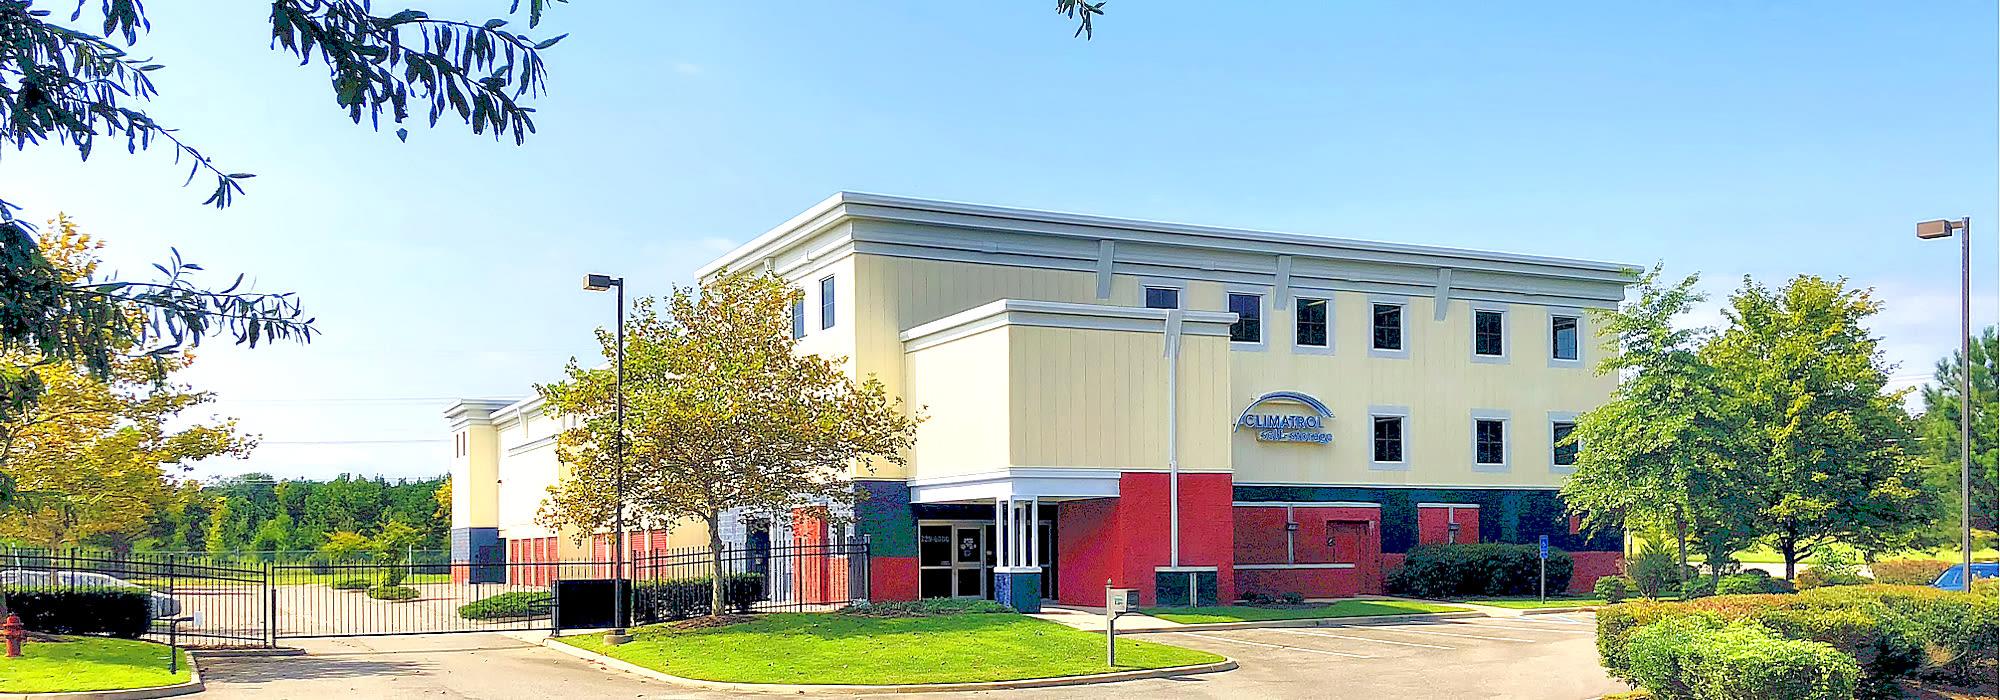 Attirant Climatrol Self Storage In Williamsburg, VA